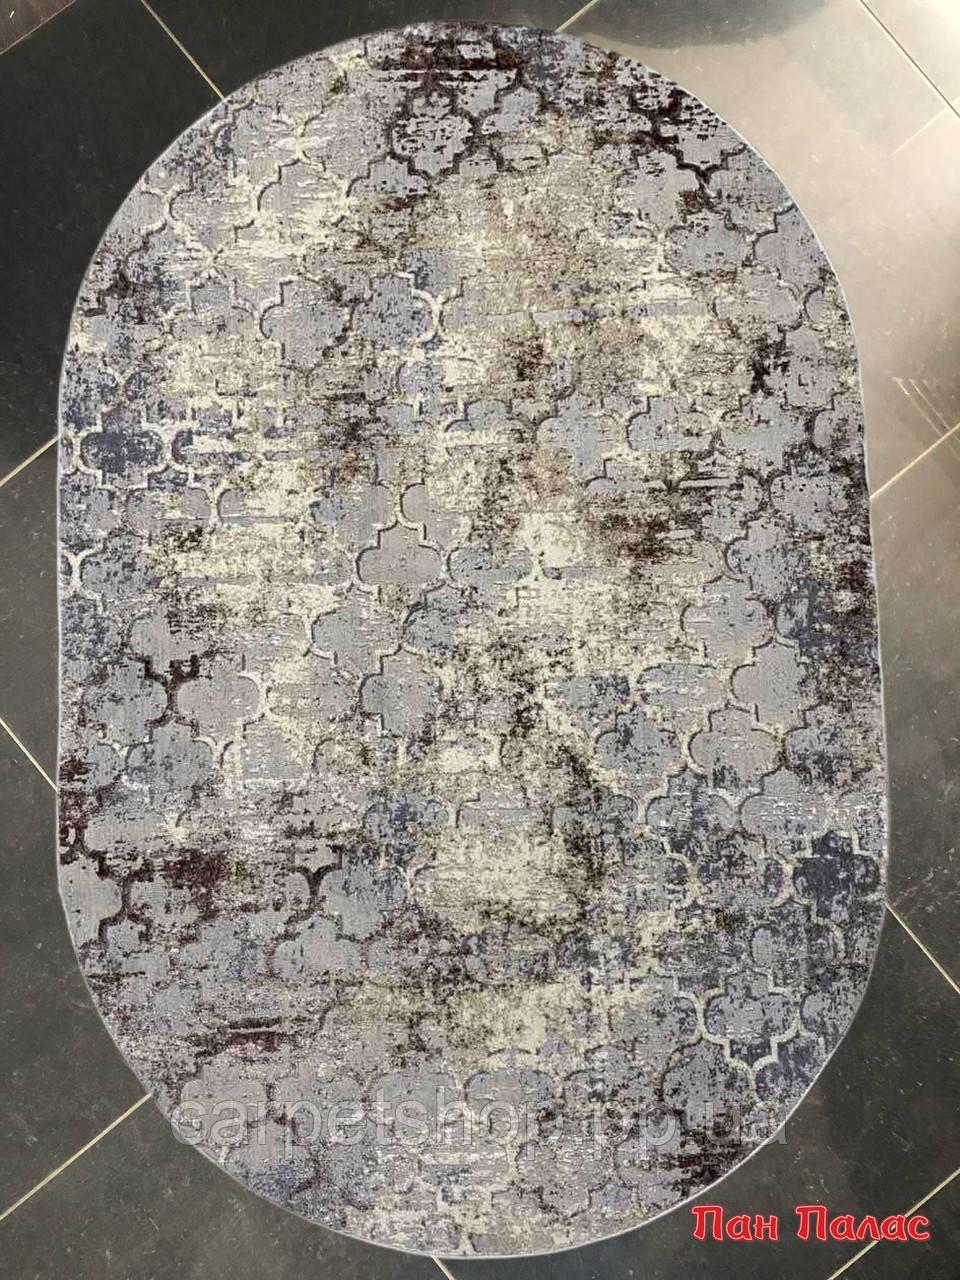 3х4 м. PERI New Rubin carpet- ковер на пол, высота ворса 9 мм. Прямоугольные и овалы!